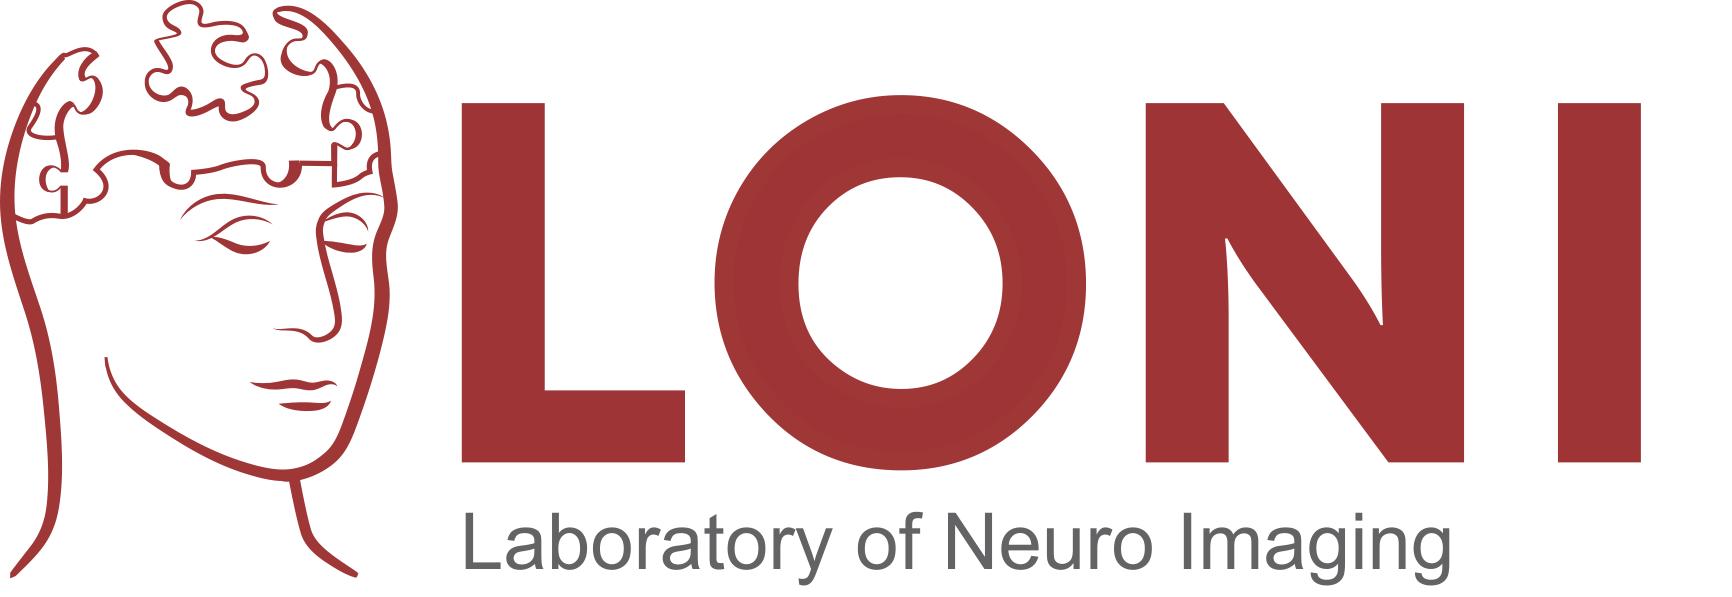 Laboratory of NeuroImaging